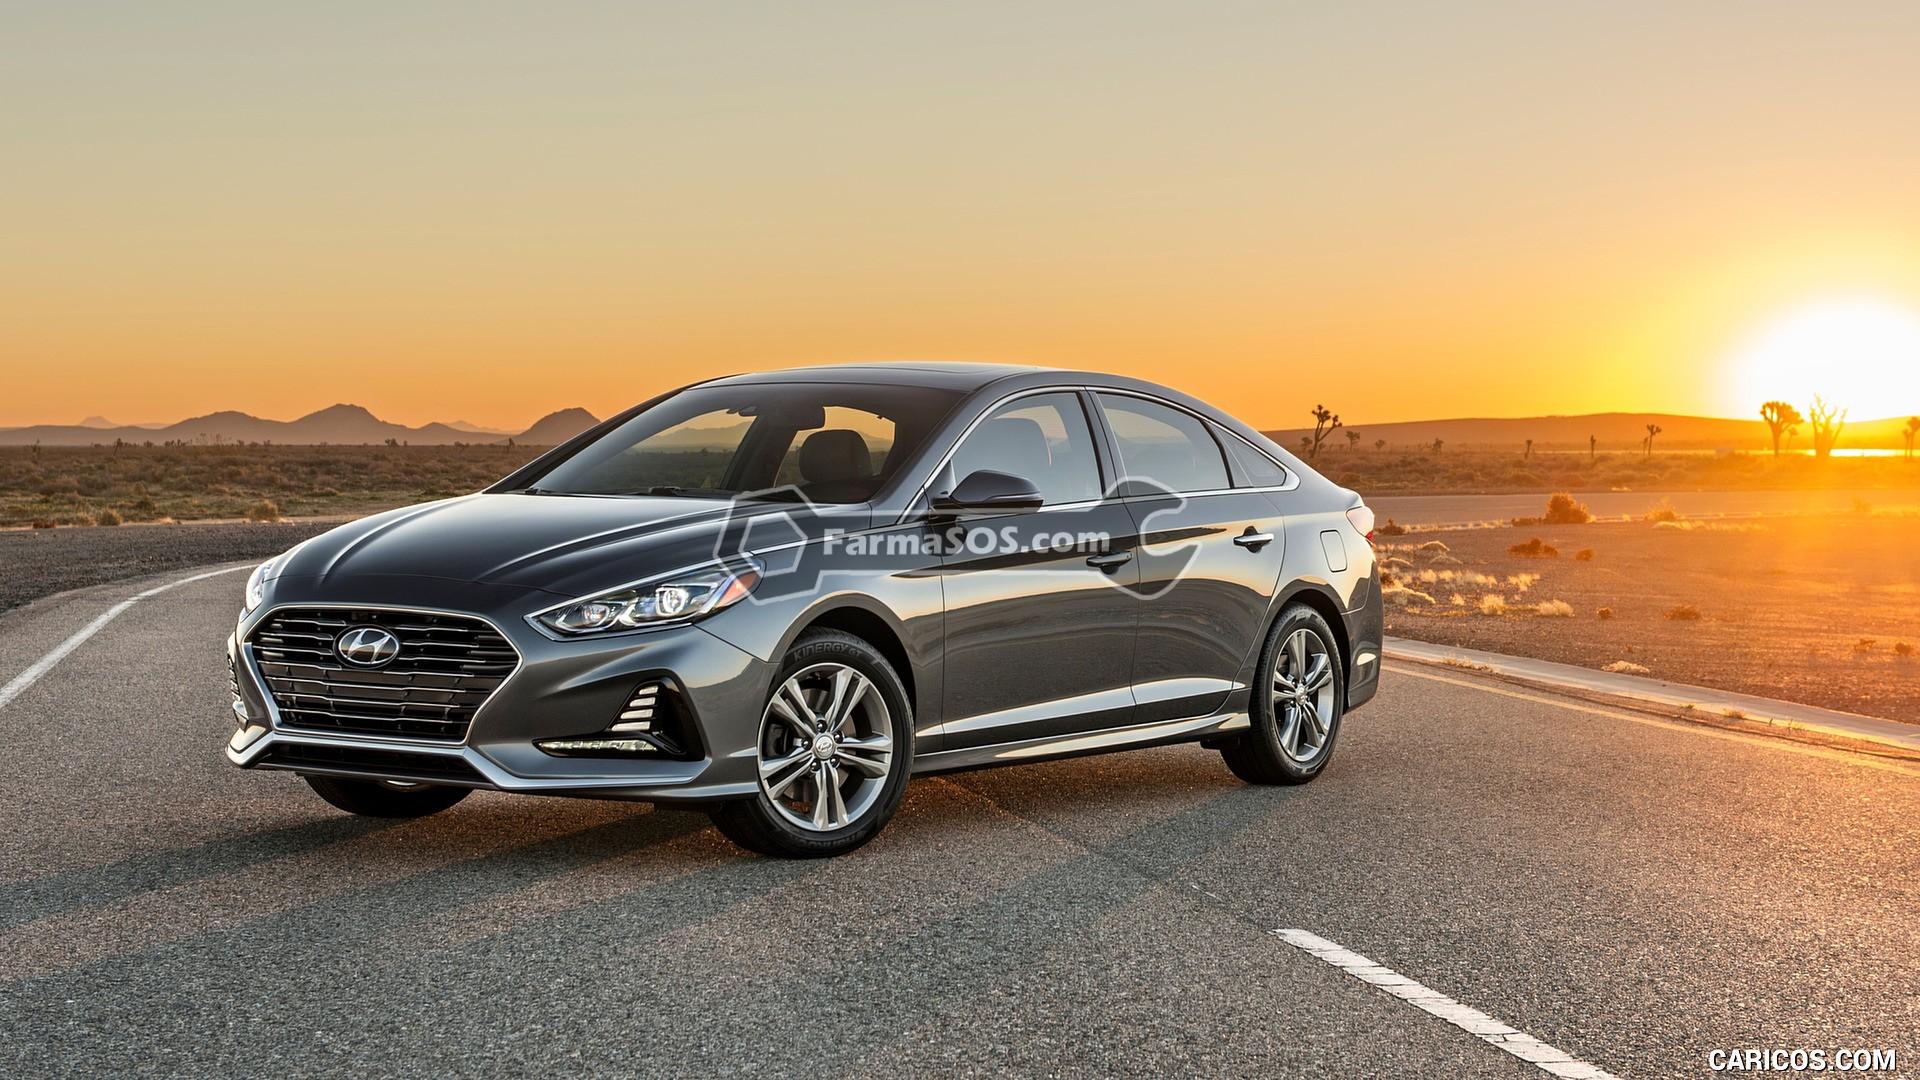 Hyundai Sonata 2018 2019 1 تصاویر هیوندای سوناتا مدل 2018 تا 2019